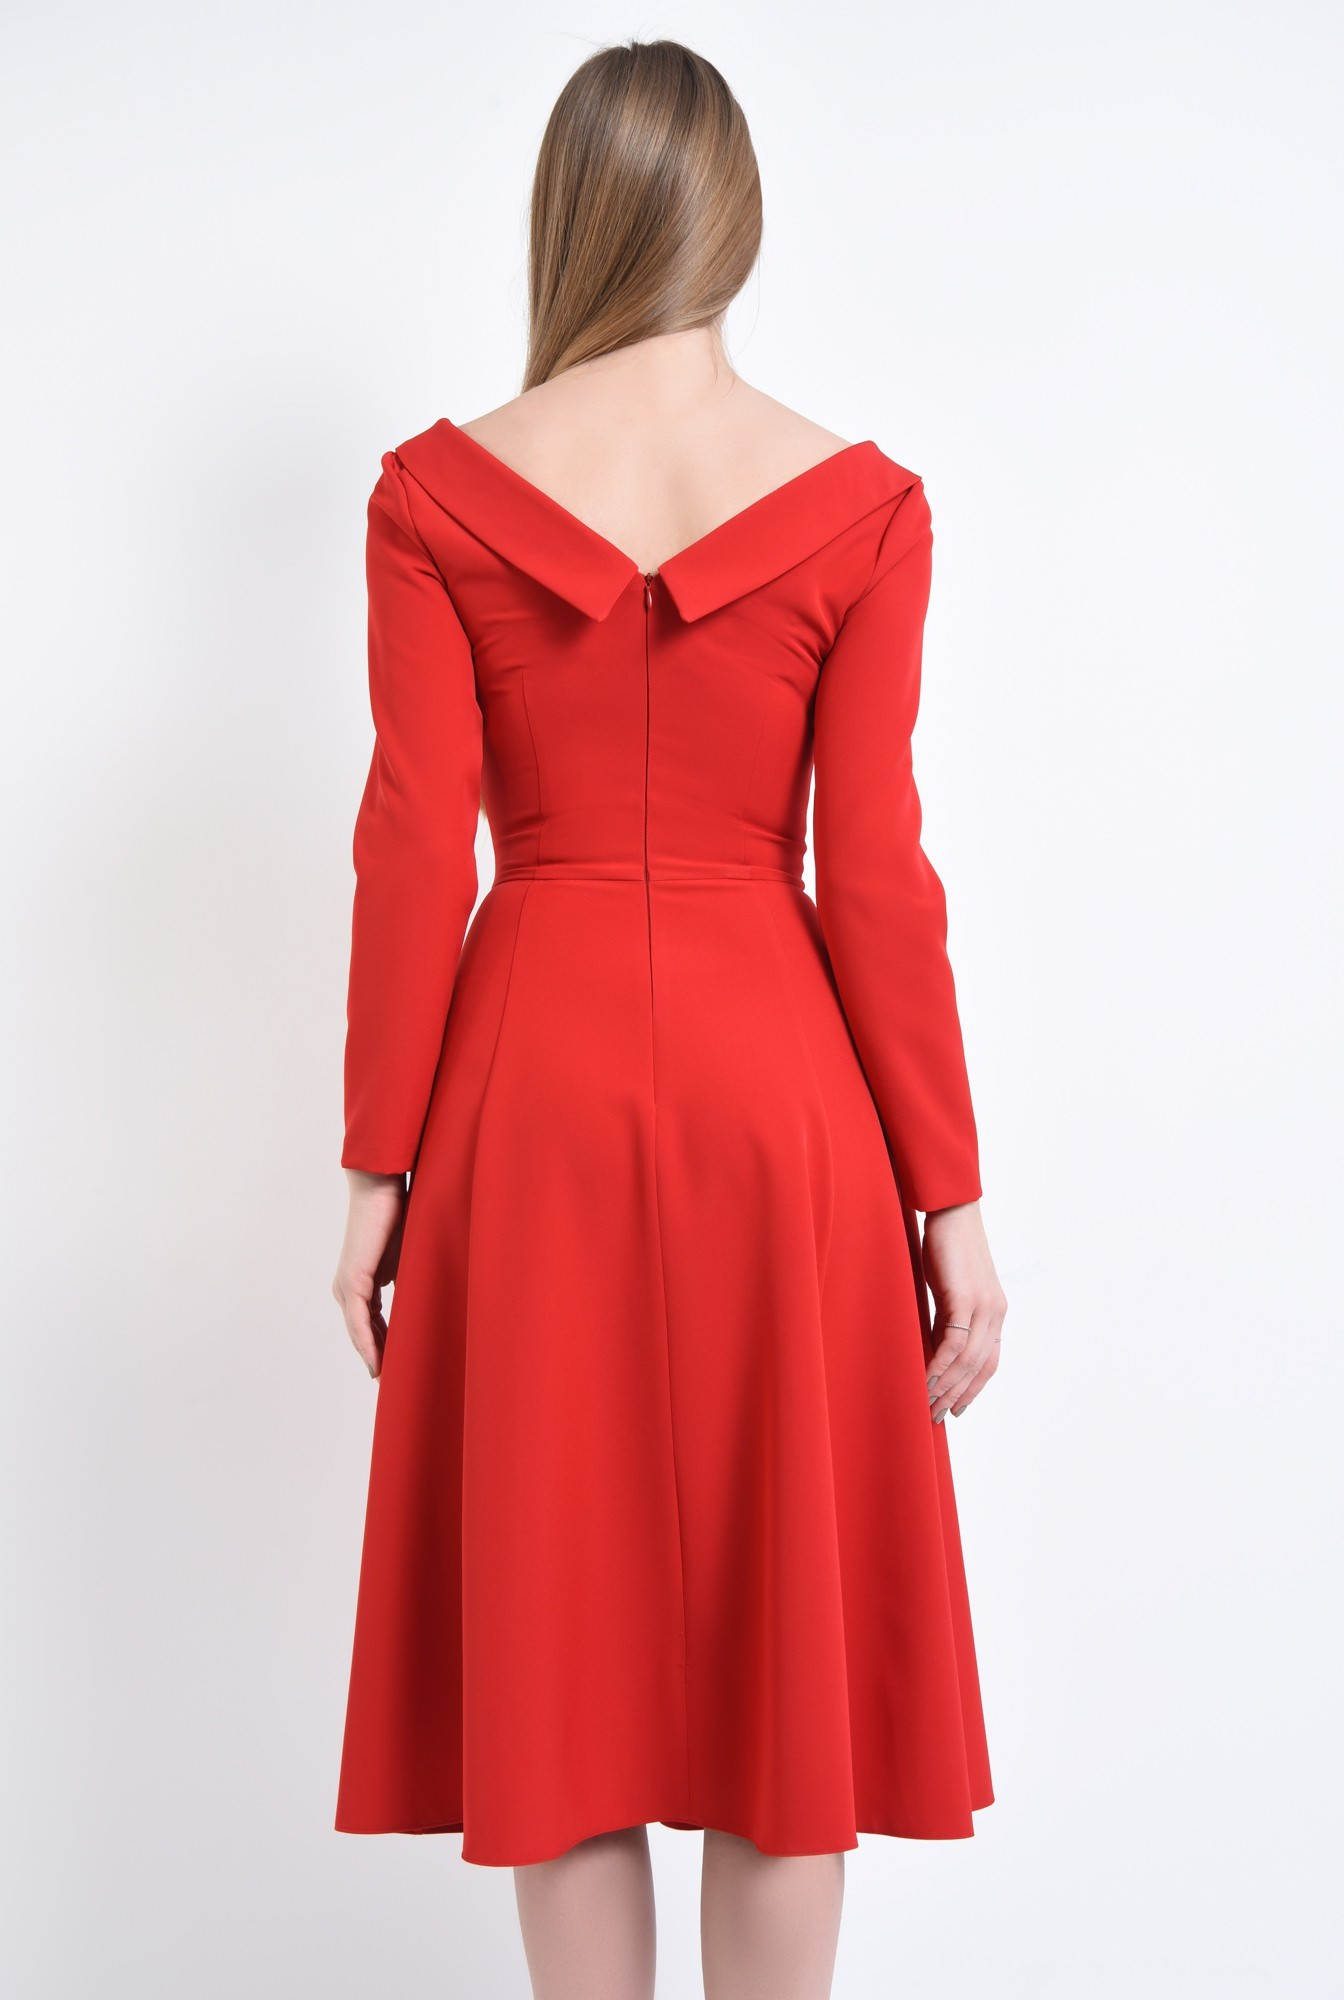 1 - Rochie de zi rosie, cloche